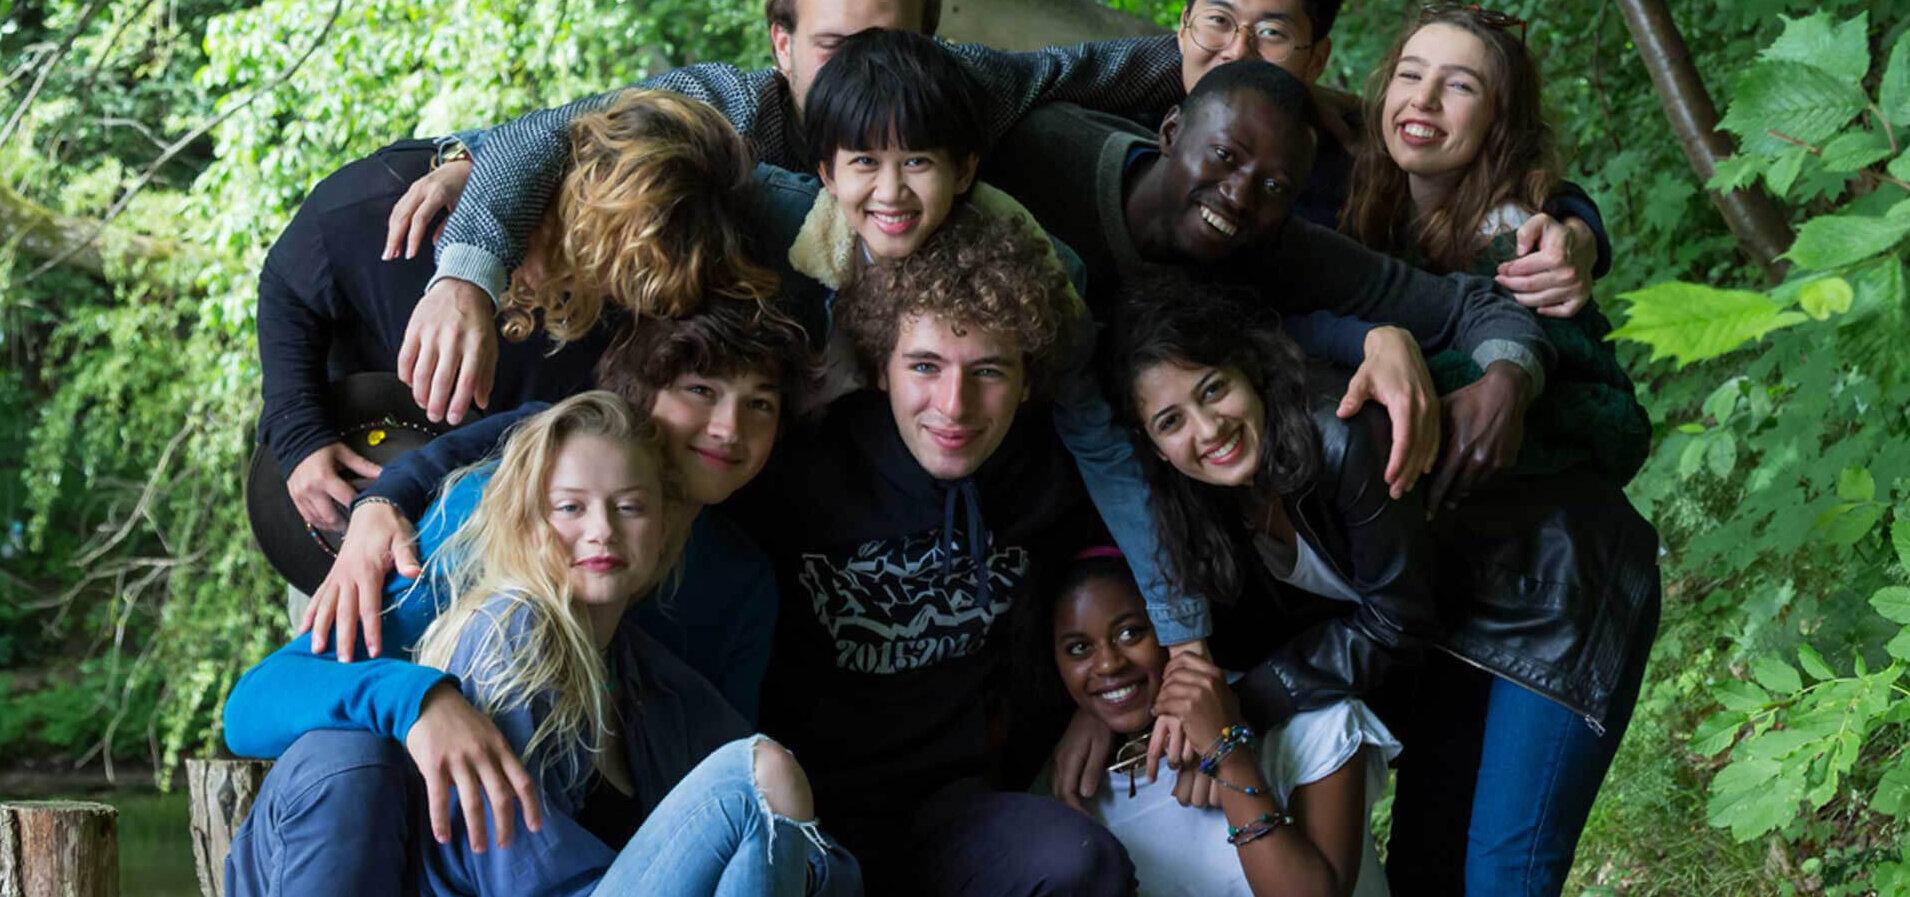 IPC - International People's College - a Folk High School in Denmark